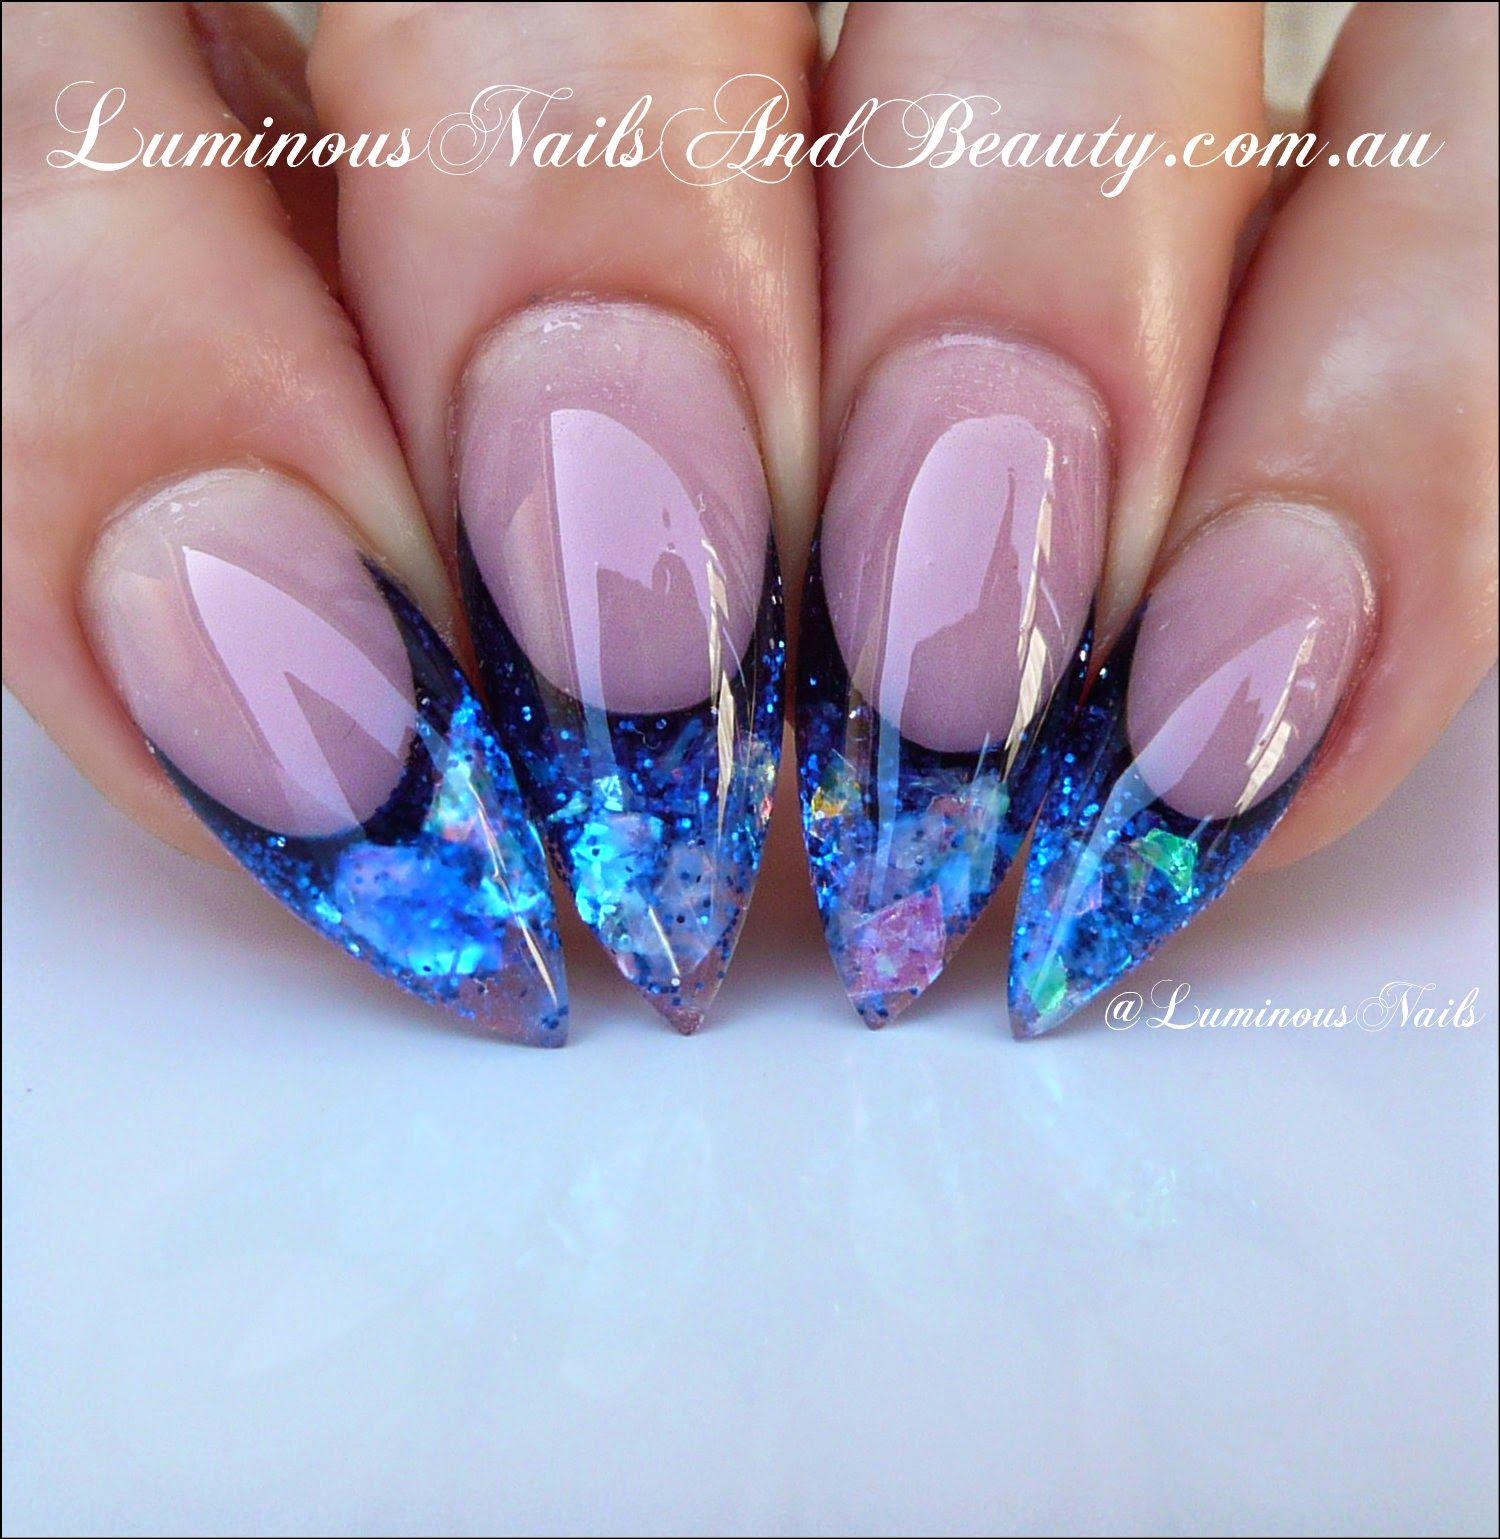 Luminous Nails: Luminous Sapphire Blue Acrylic Nails